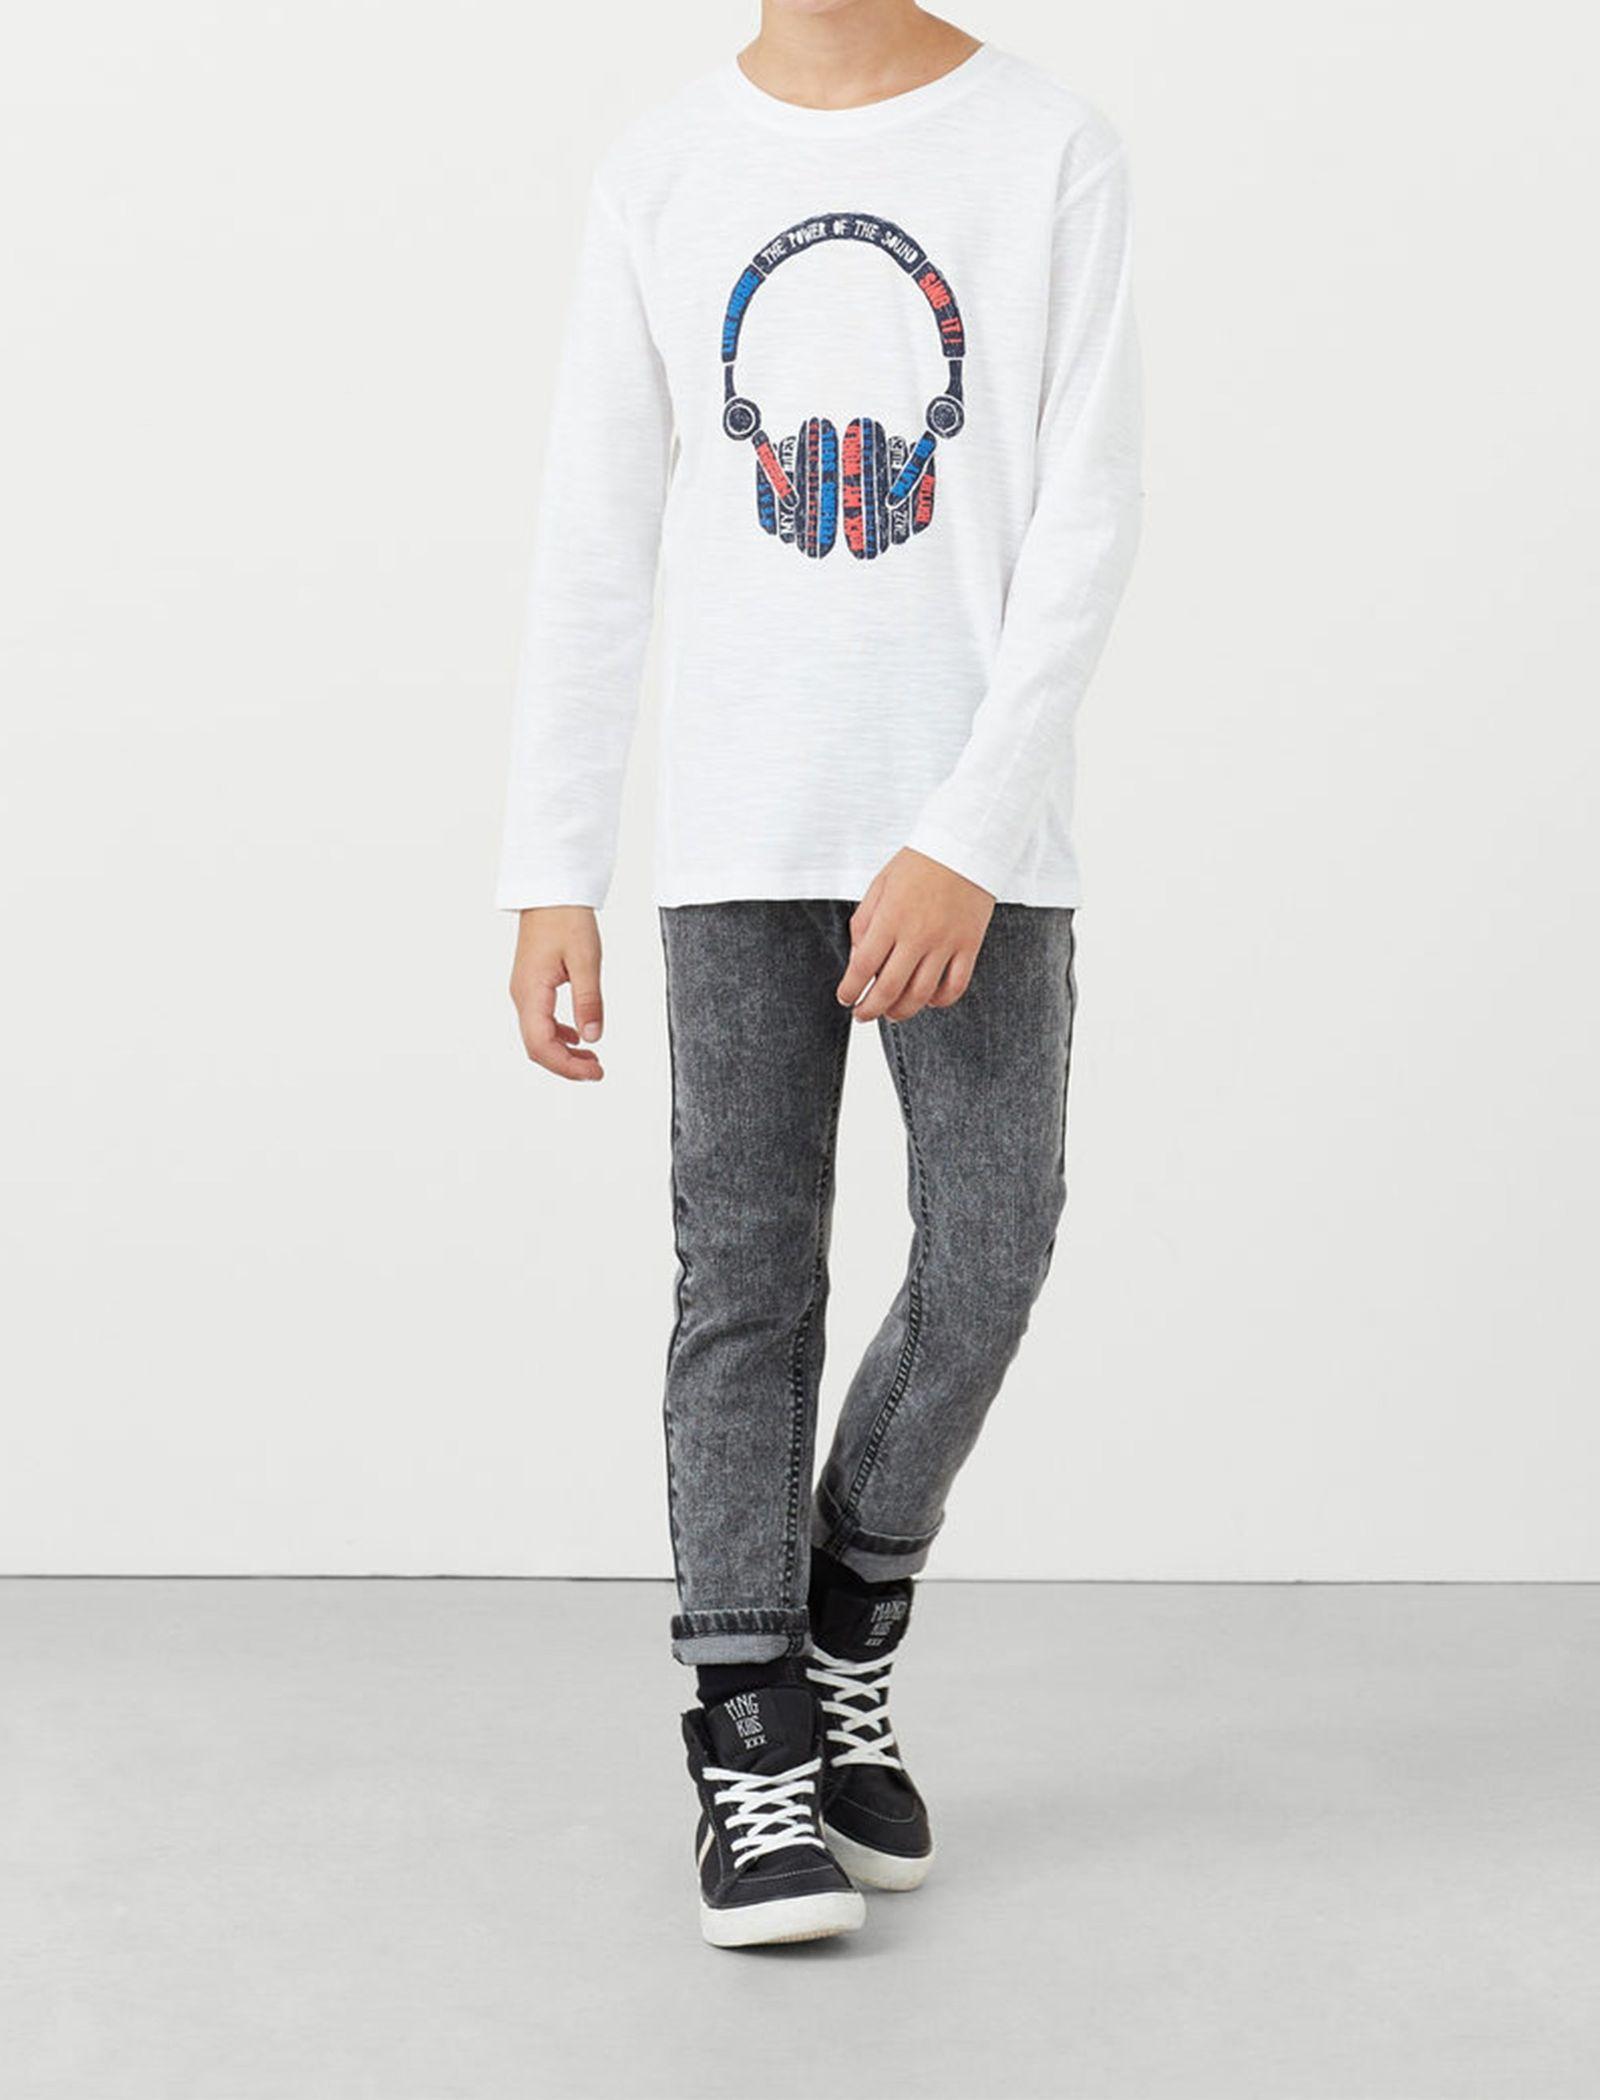 تی شرت نخی پسرانه - مانگو - سفيد - 5